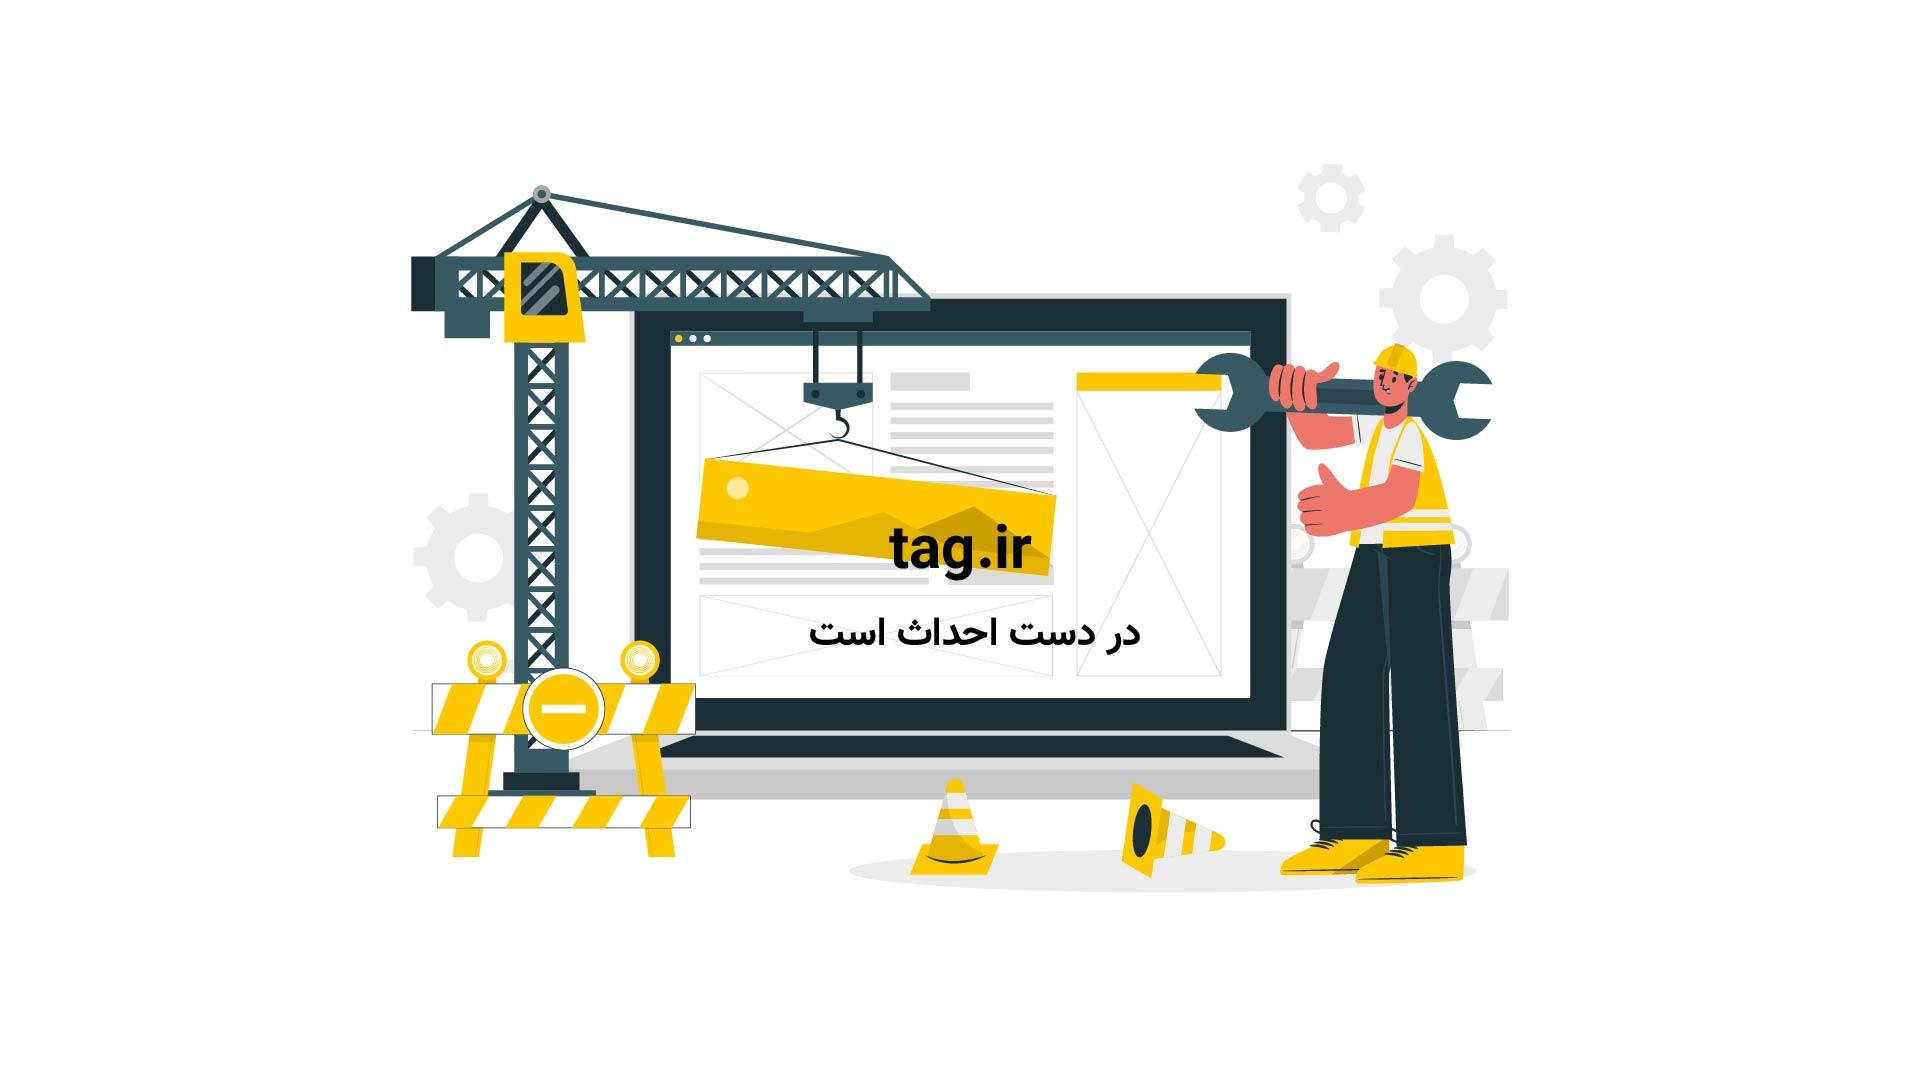 محمدرضا سرشار | تگ